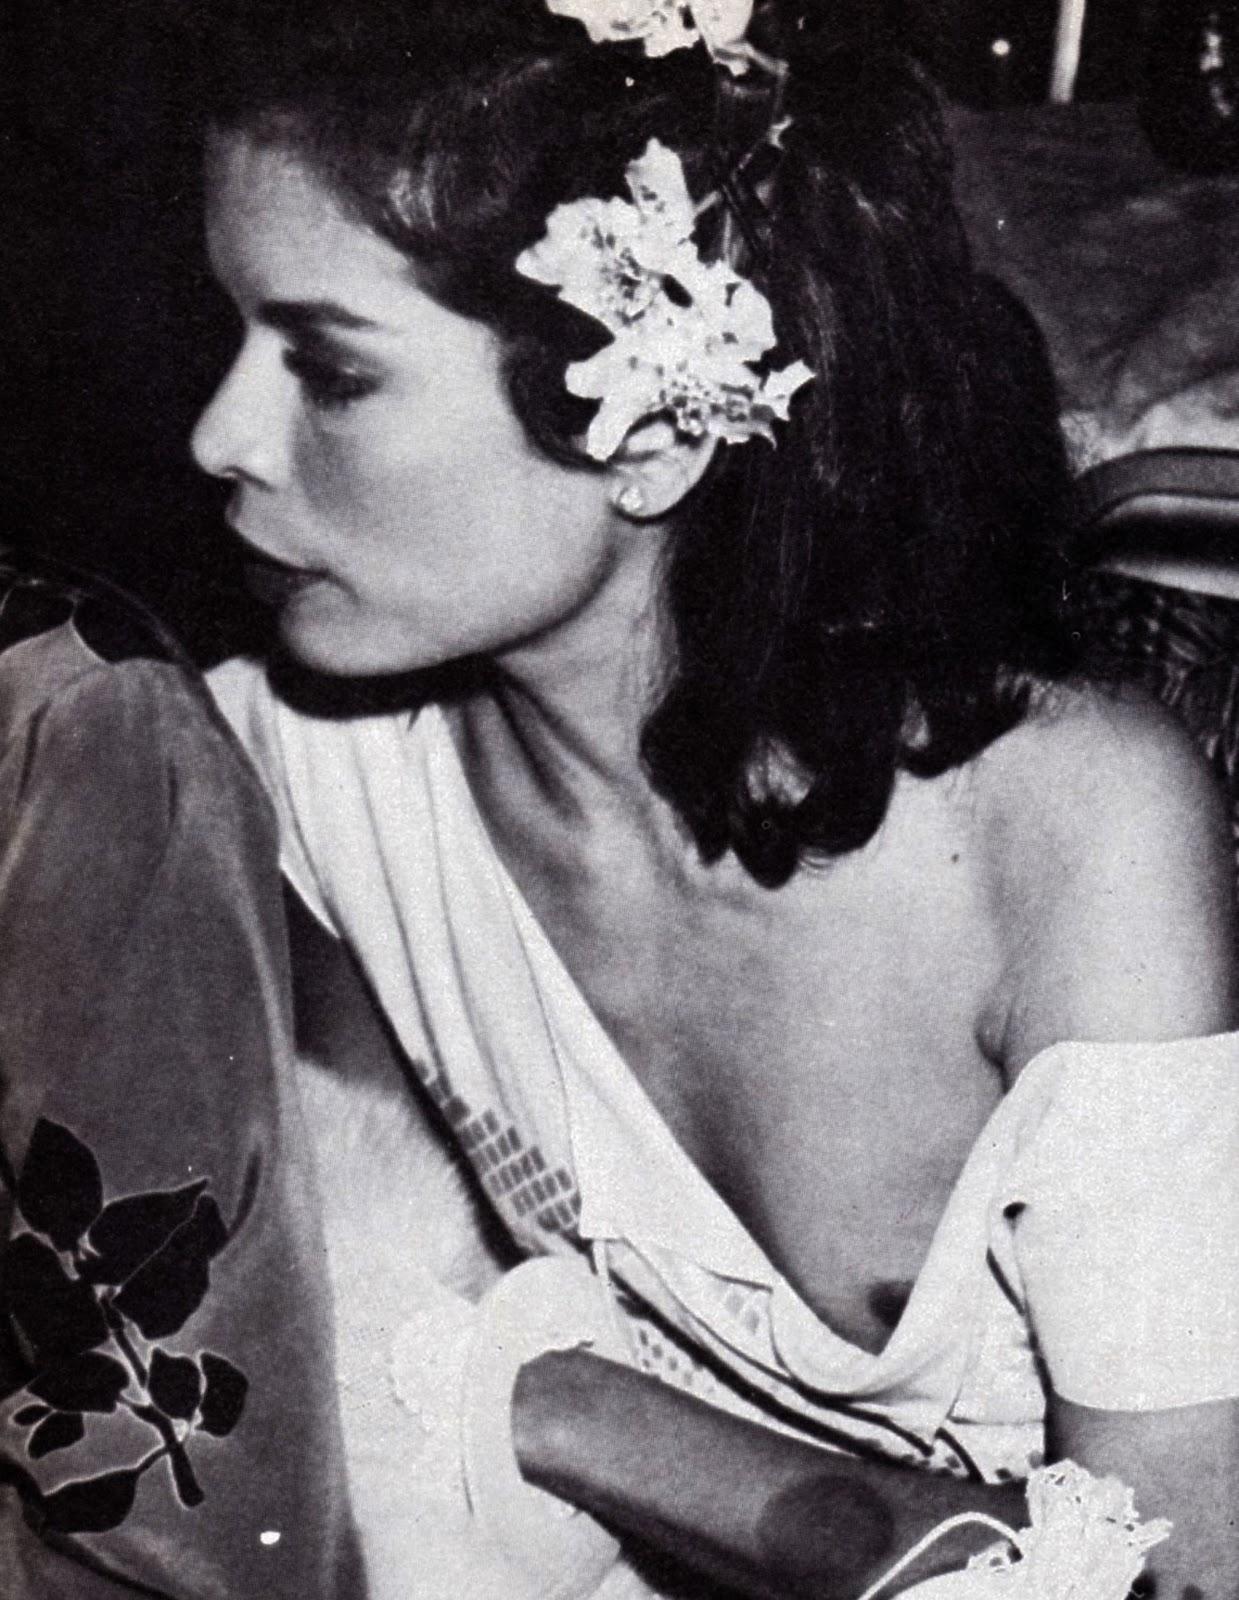 amateur-jizz-naked-bianca-black-and-white